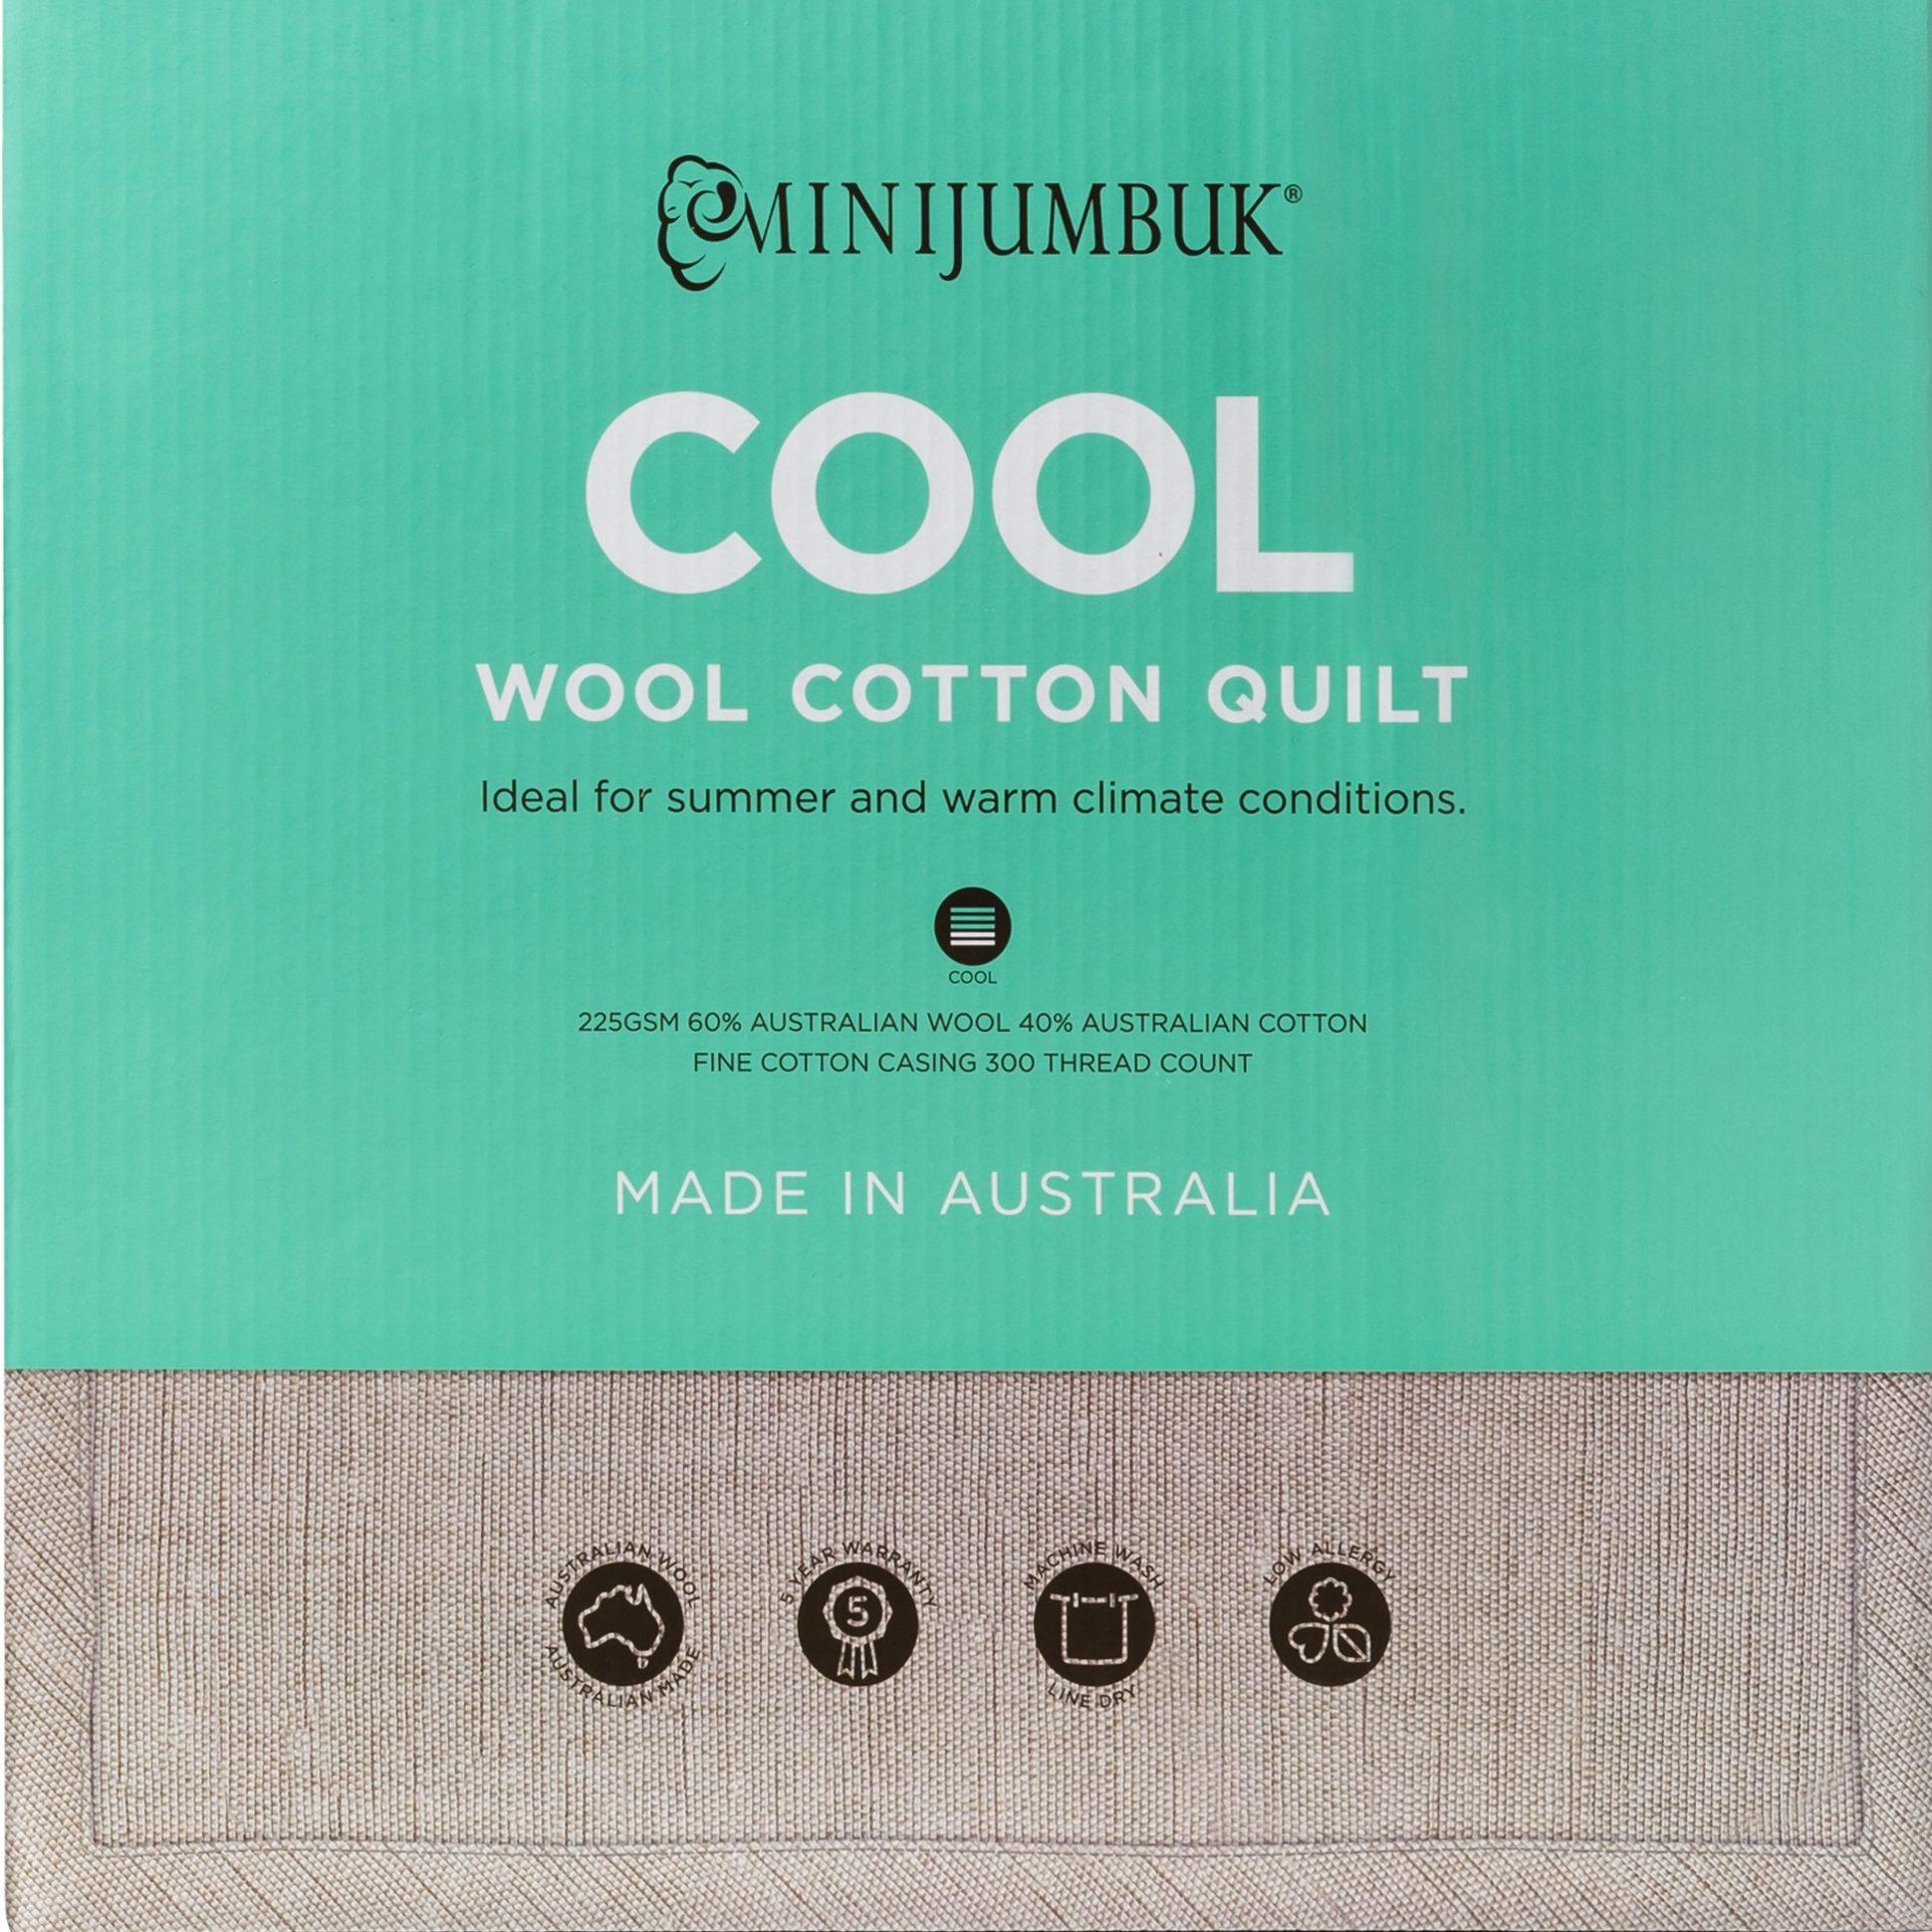 MiniJumbuk – Cool Wool Cotton Quilt